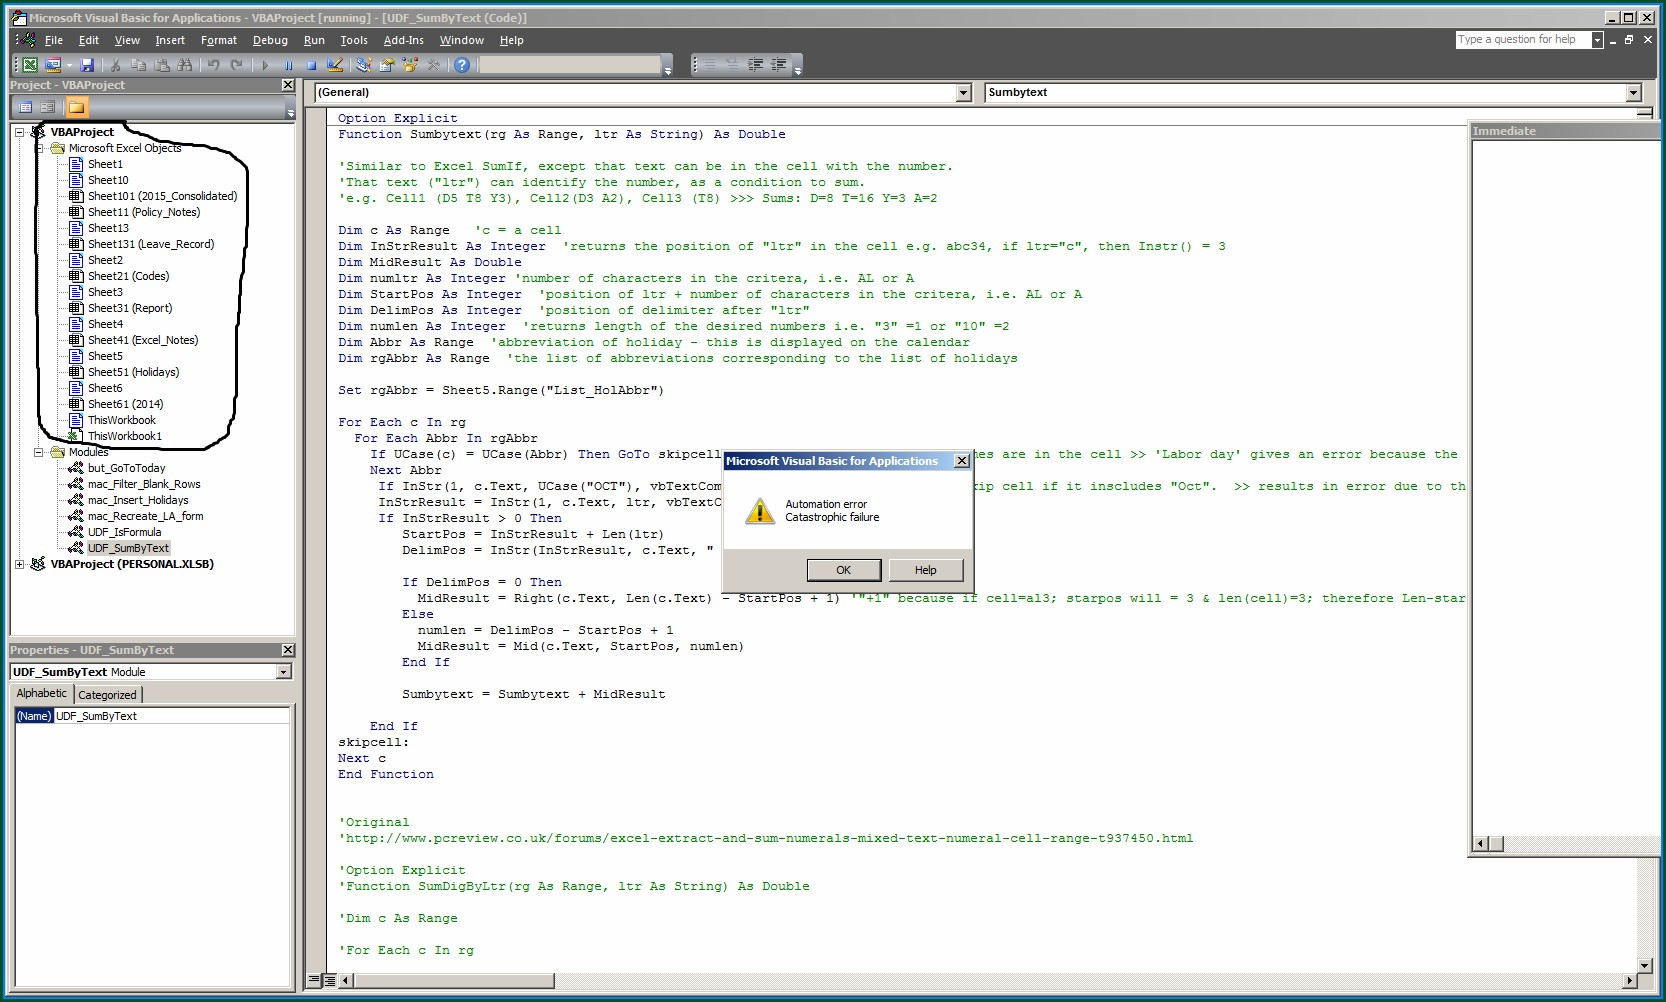 Excel Vba Delete Default Sheets Worksheet Resume Examples